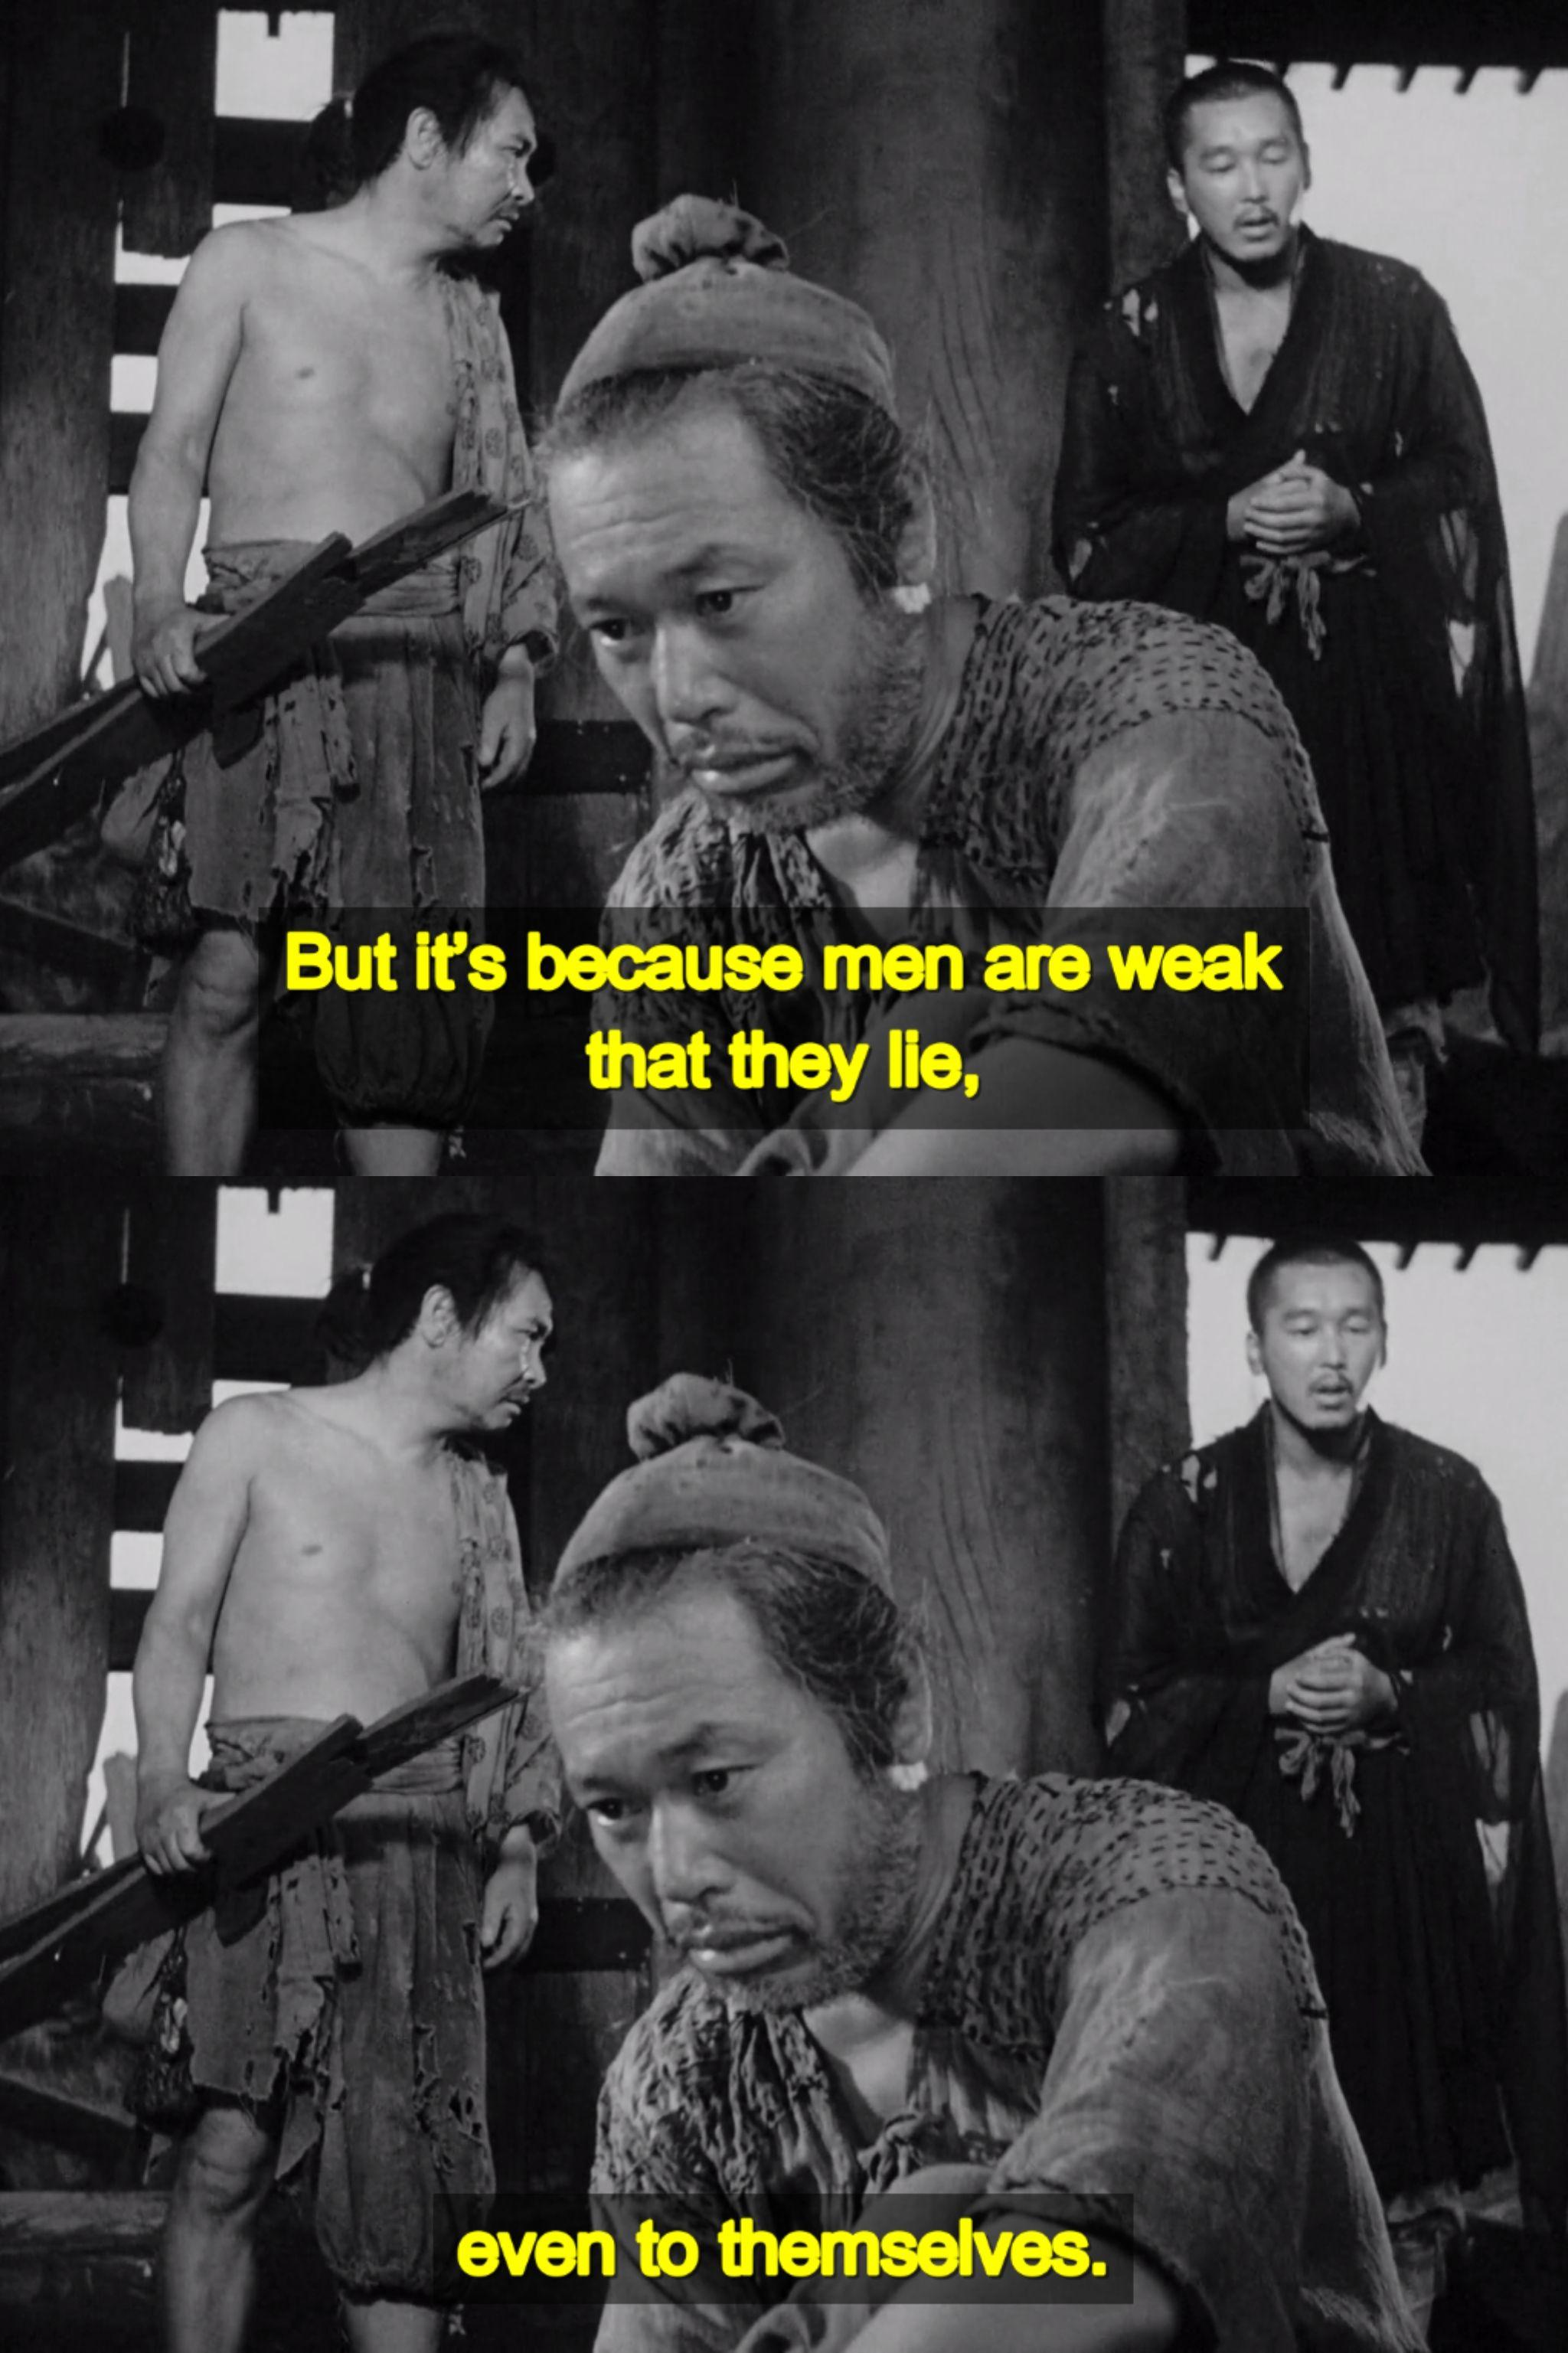 Rashomon 1950 By Akira Kurosawa Cinema Movies Tv Series Quotes Foreign Film